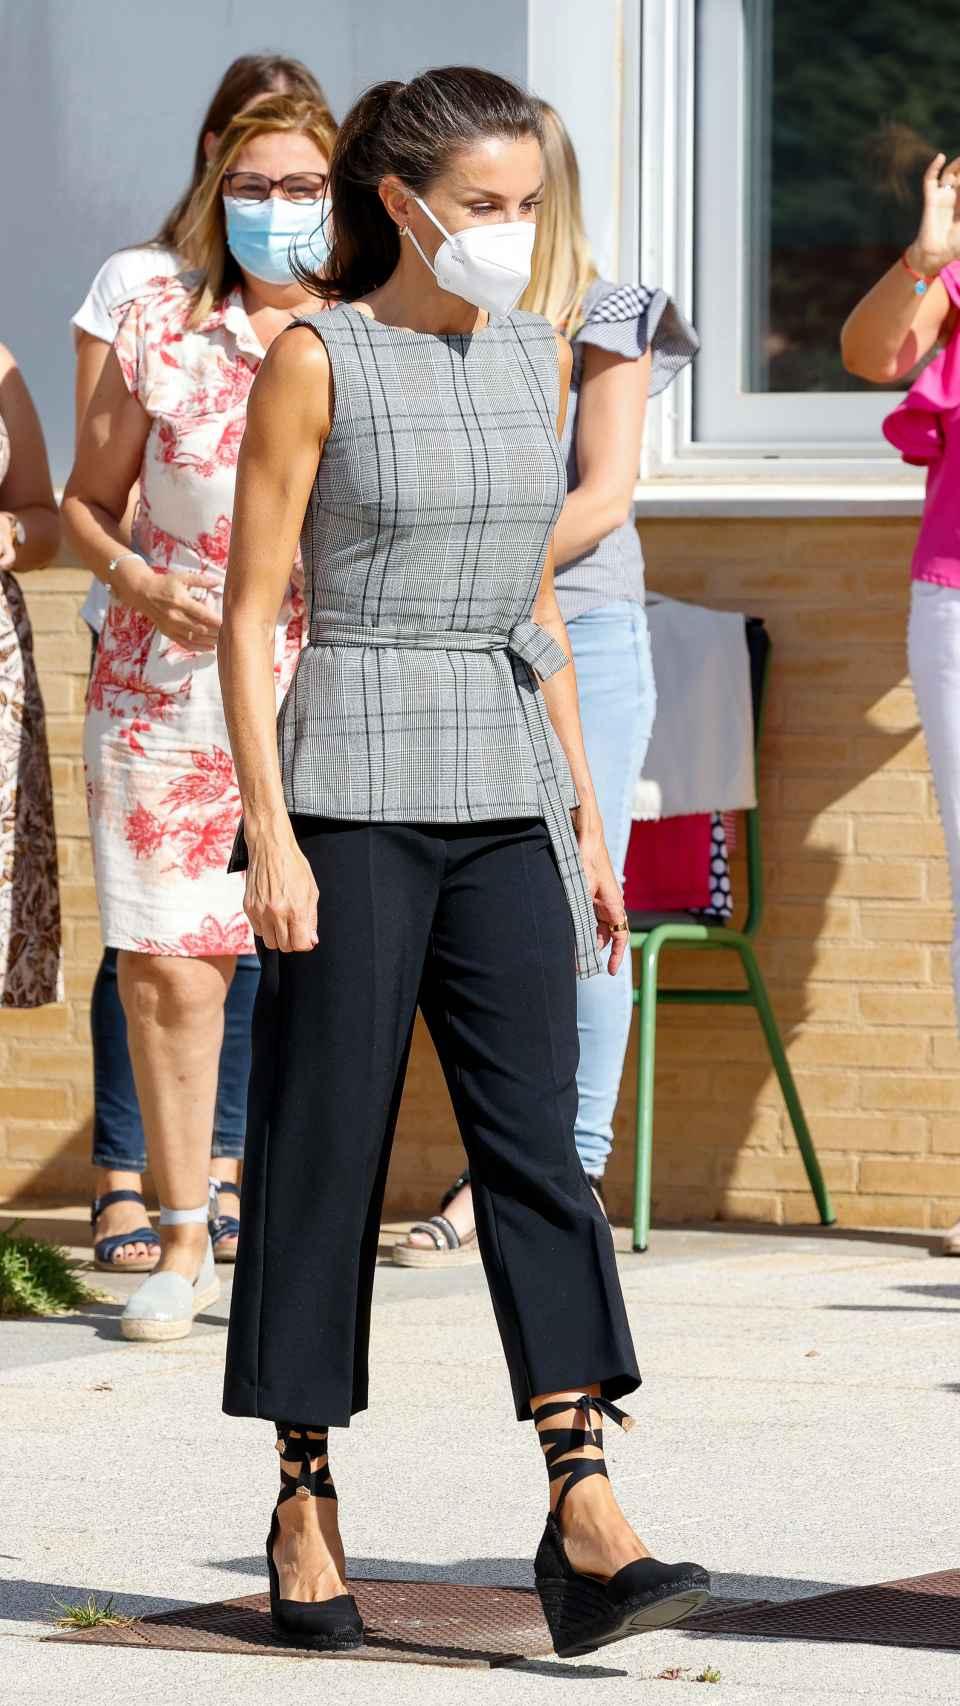 La reina Letizia en la apertura del Curso Escolar 2020-2021 en Navarra.